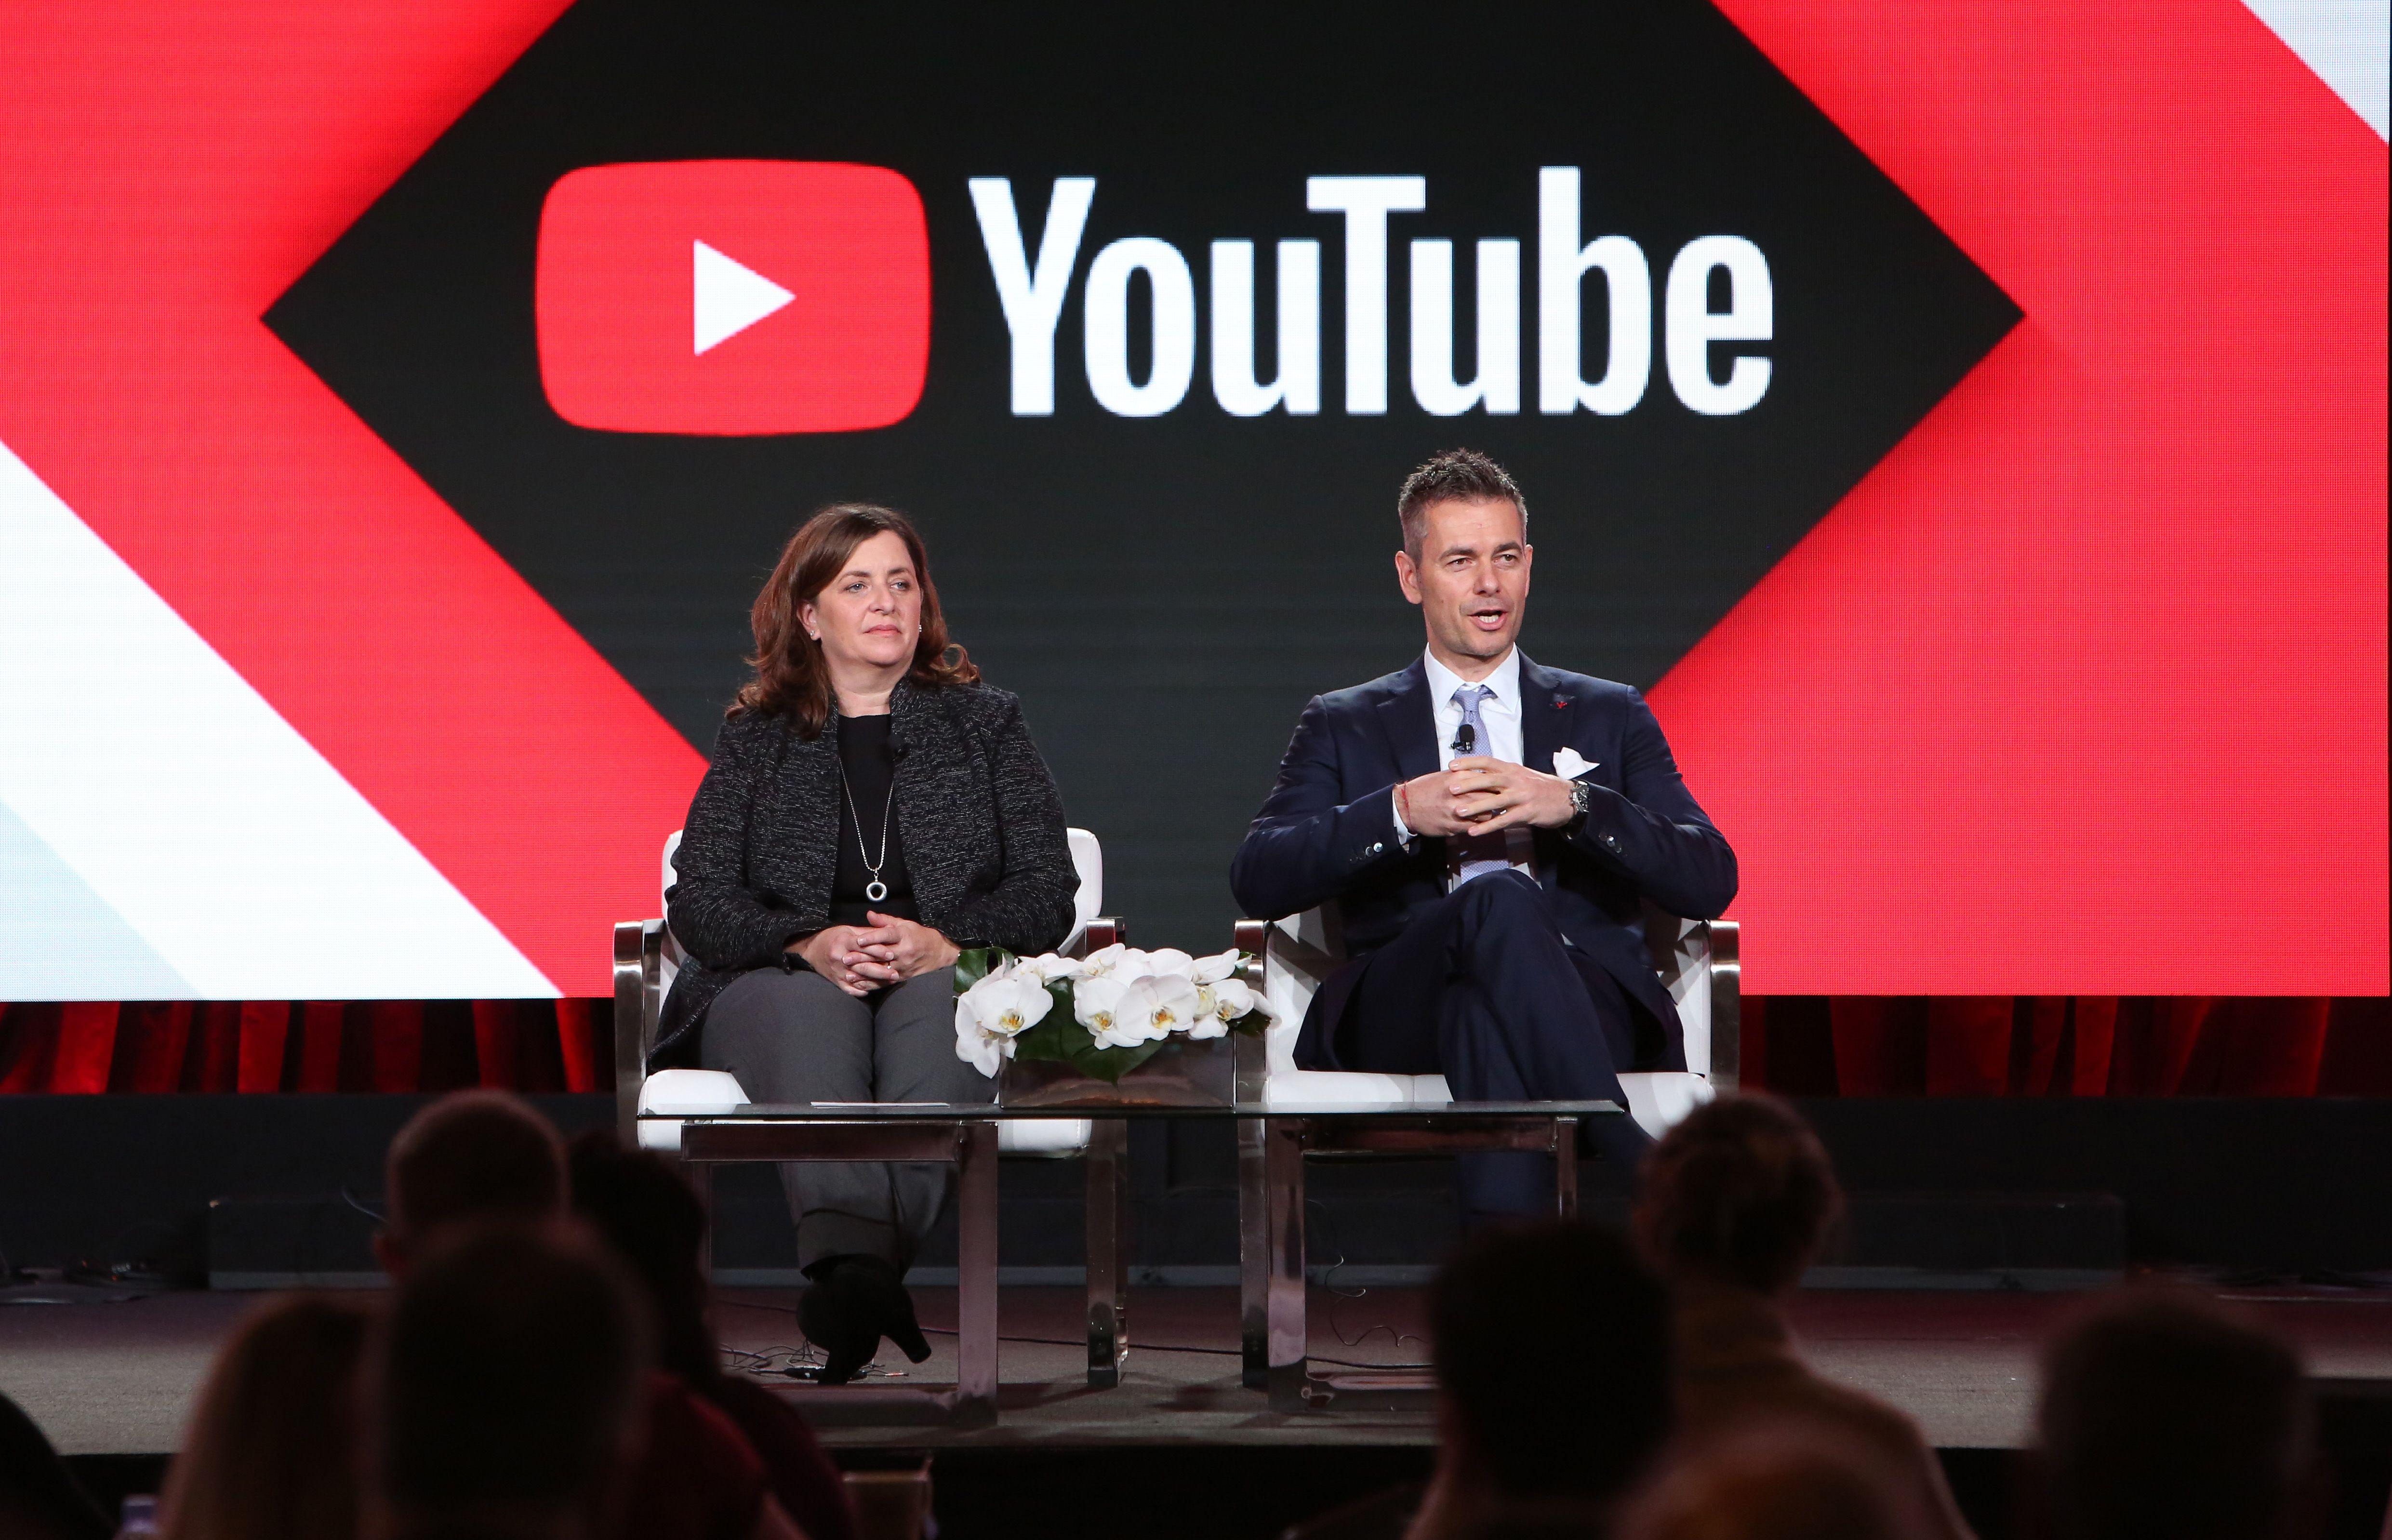 YouTube Execs on Logan Paul Scandal: